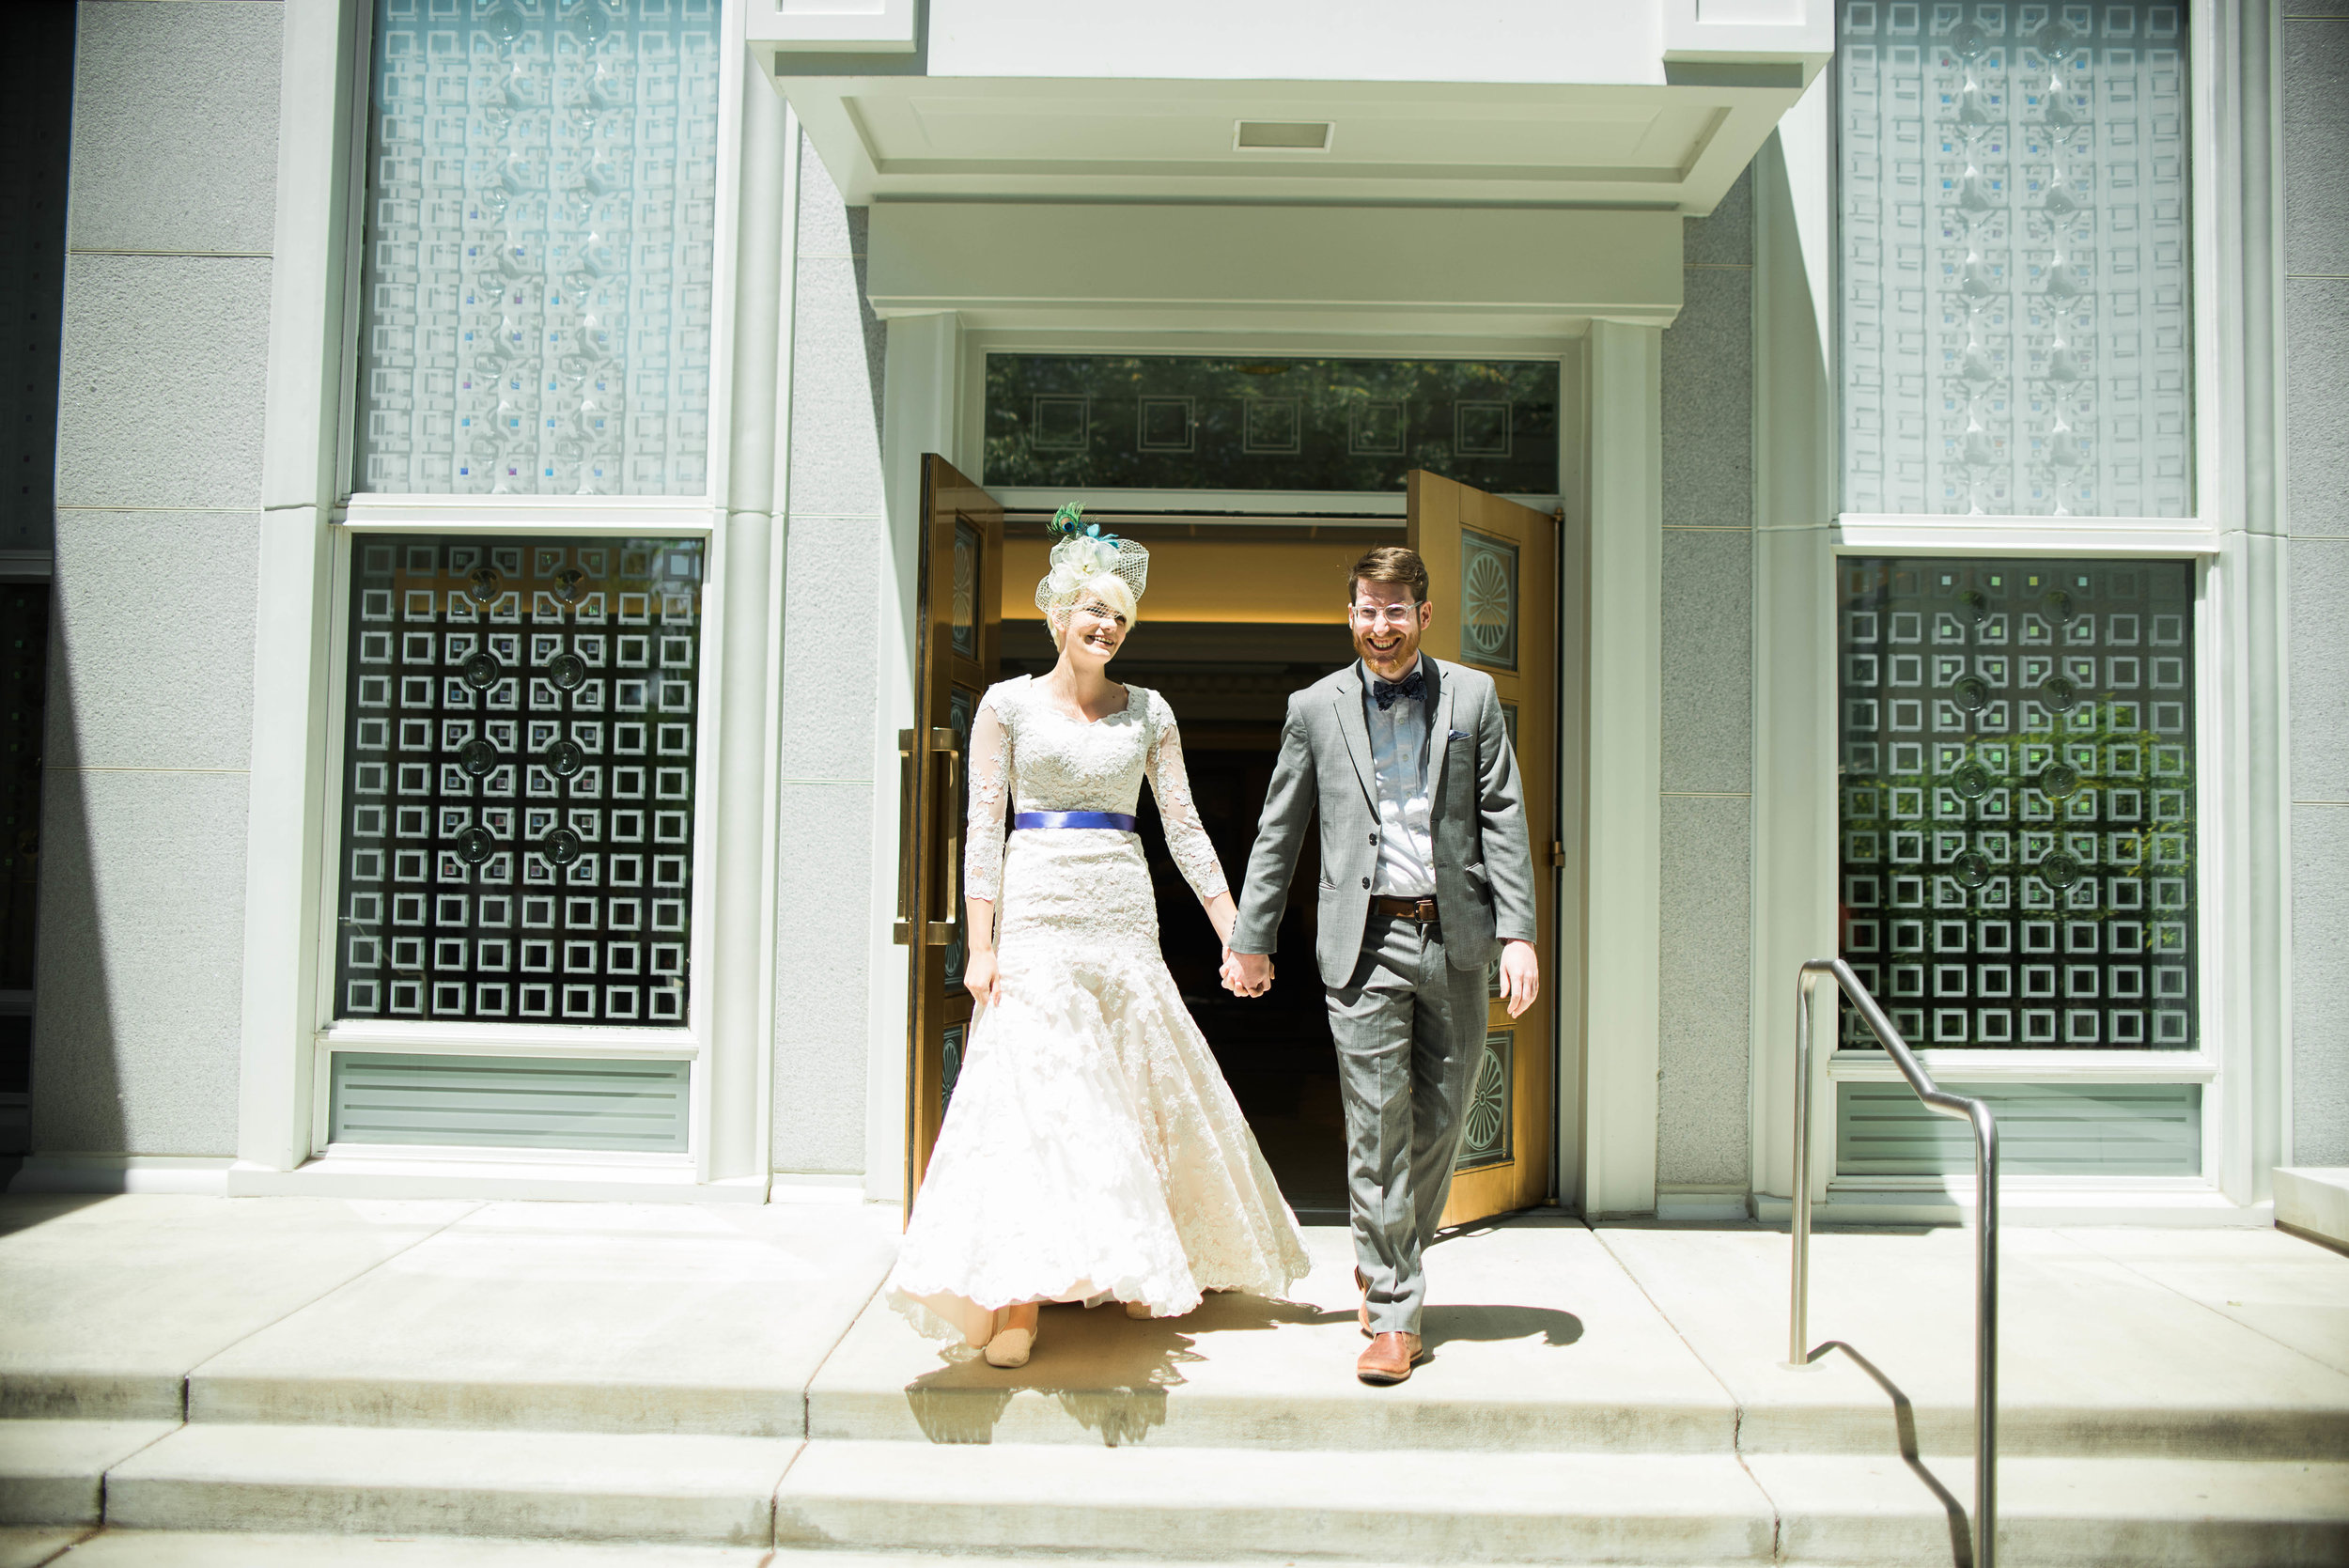 K+M-Wedding-DaySadie_Banks_Photography-27.jpg